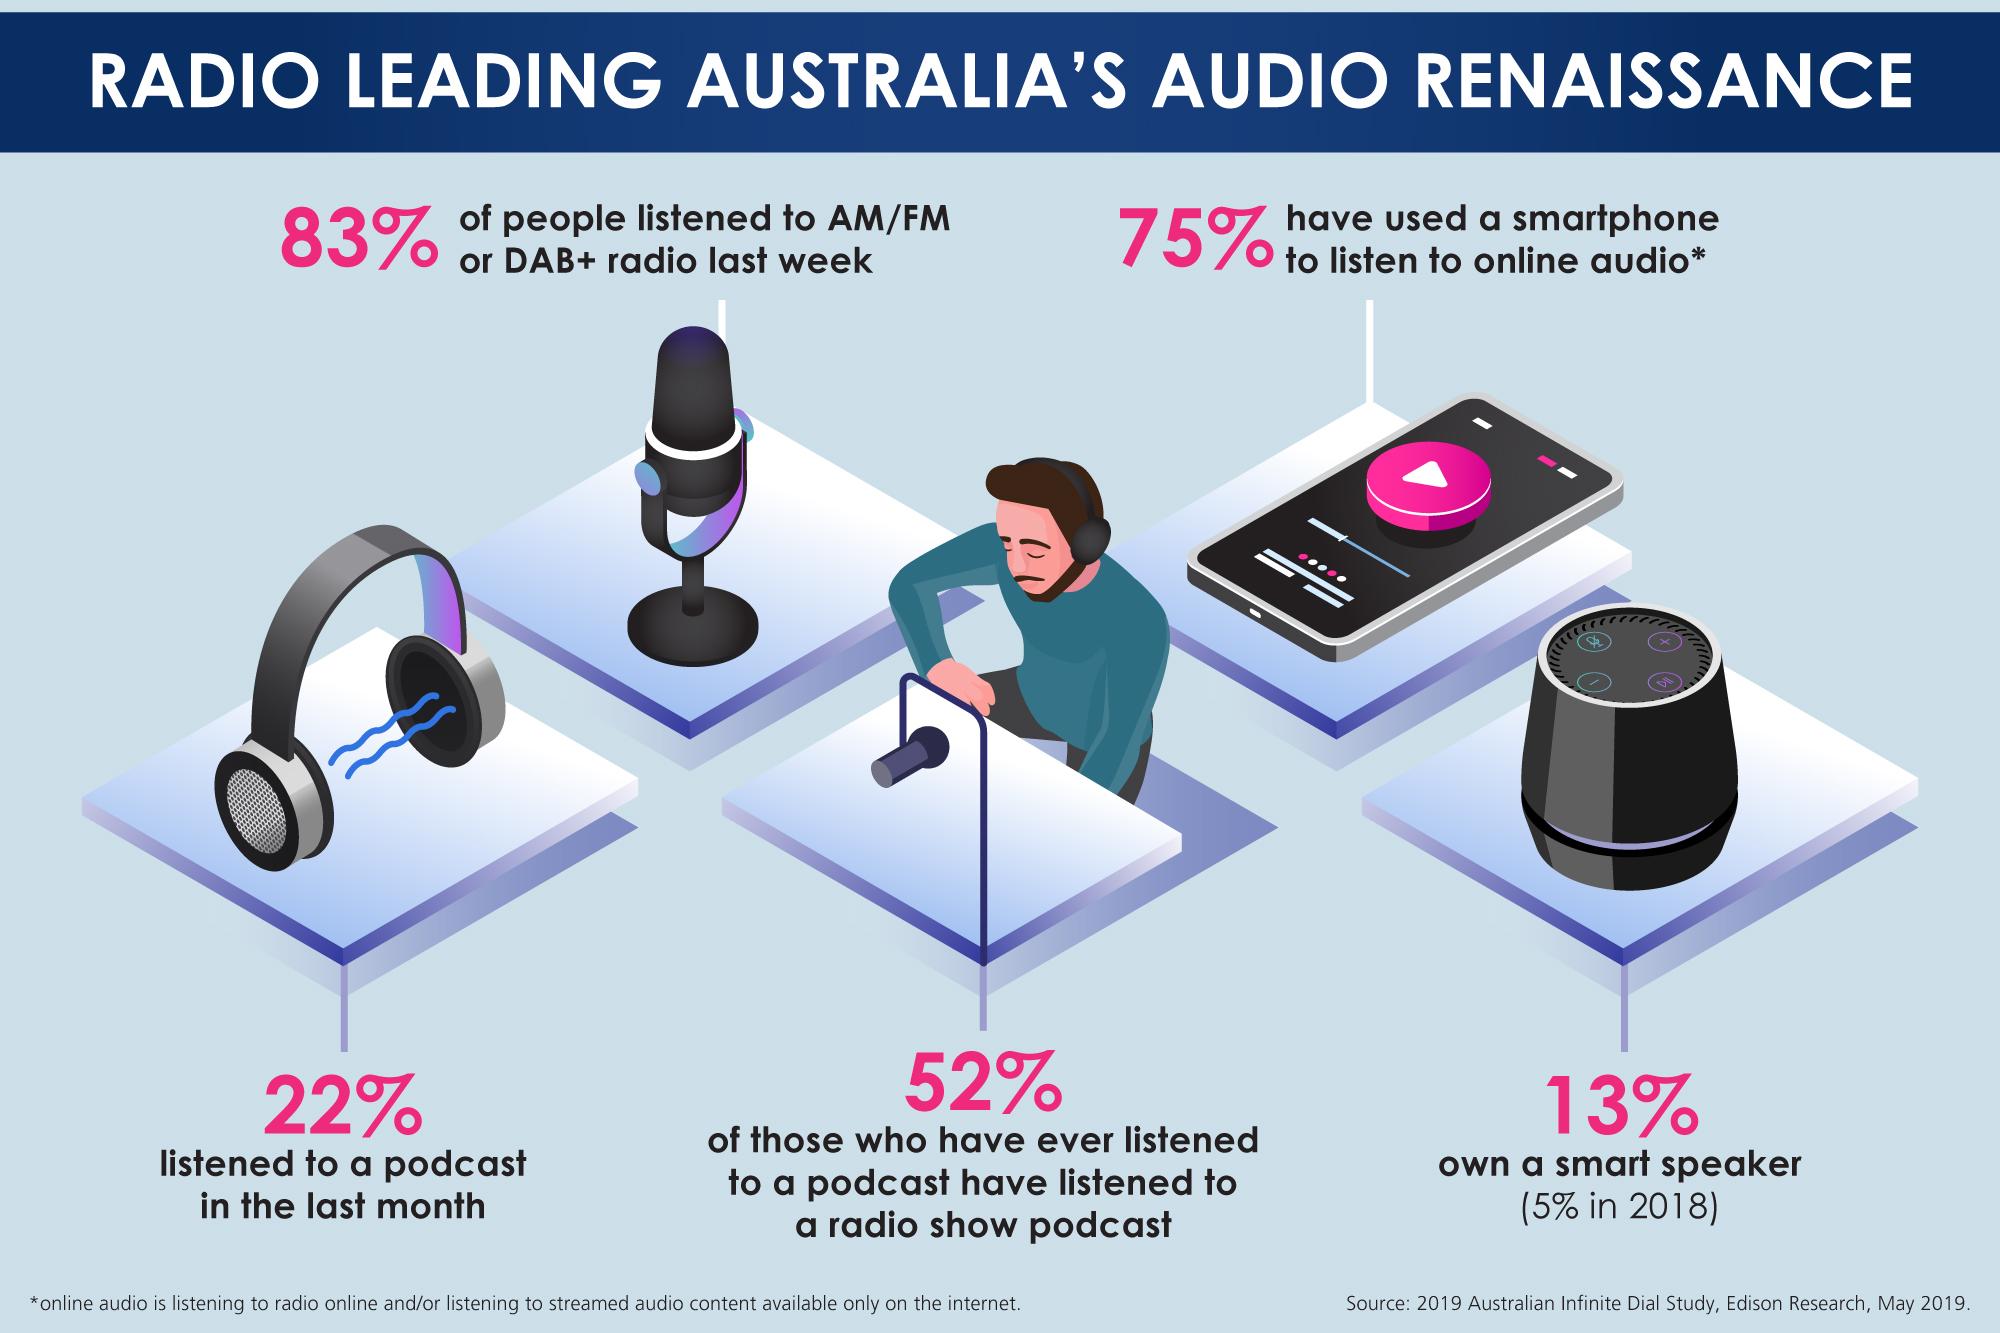 showcase podcast listening behaviour - HD2000×1333